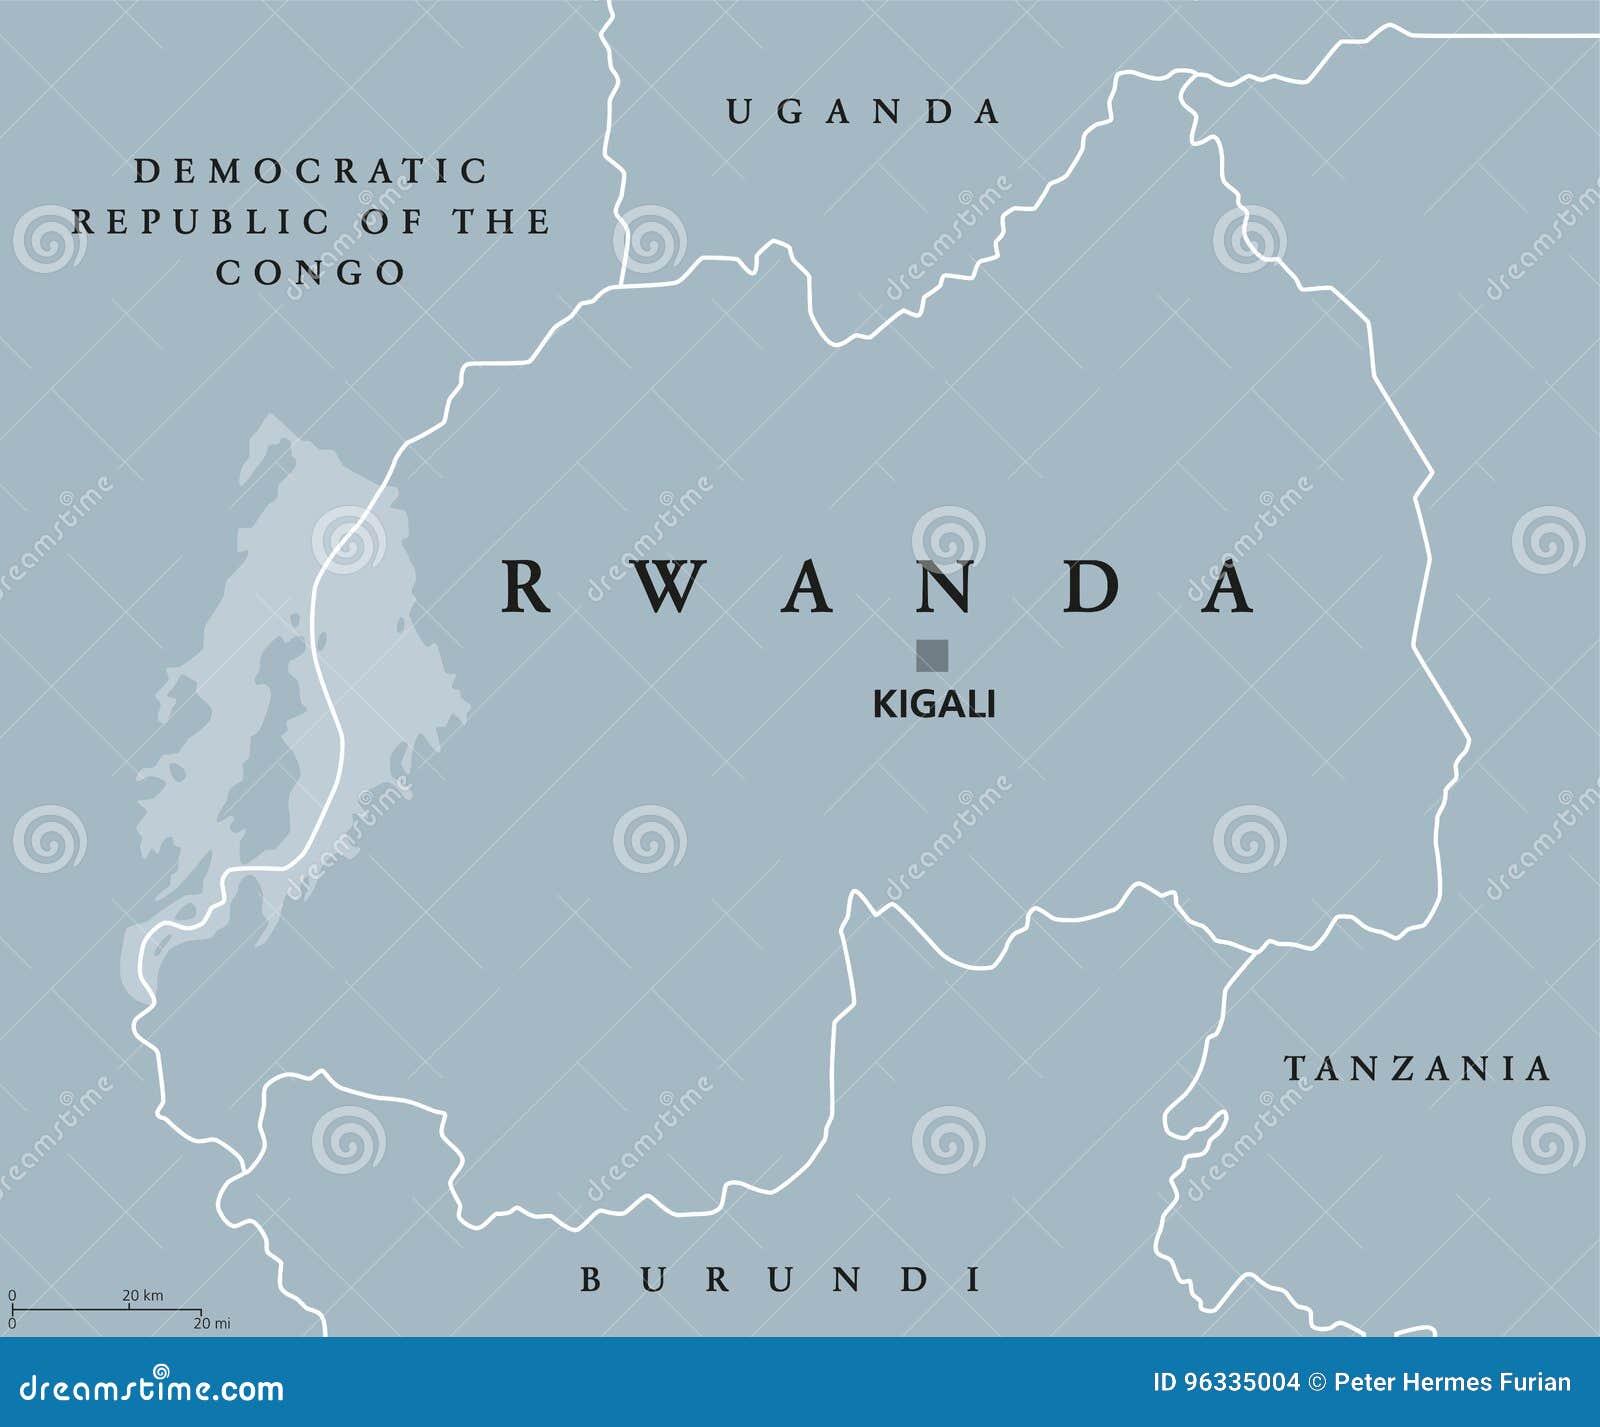 Rwanda political map stock vector. Illustration of democratic - 96335004